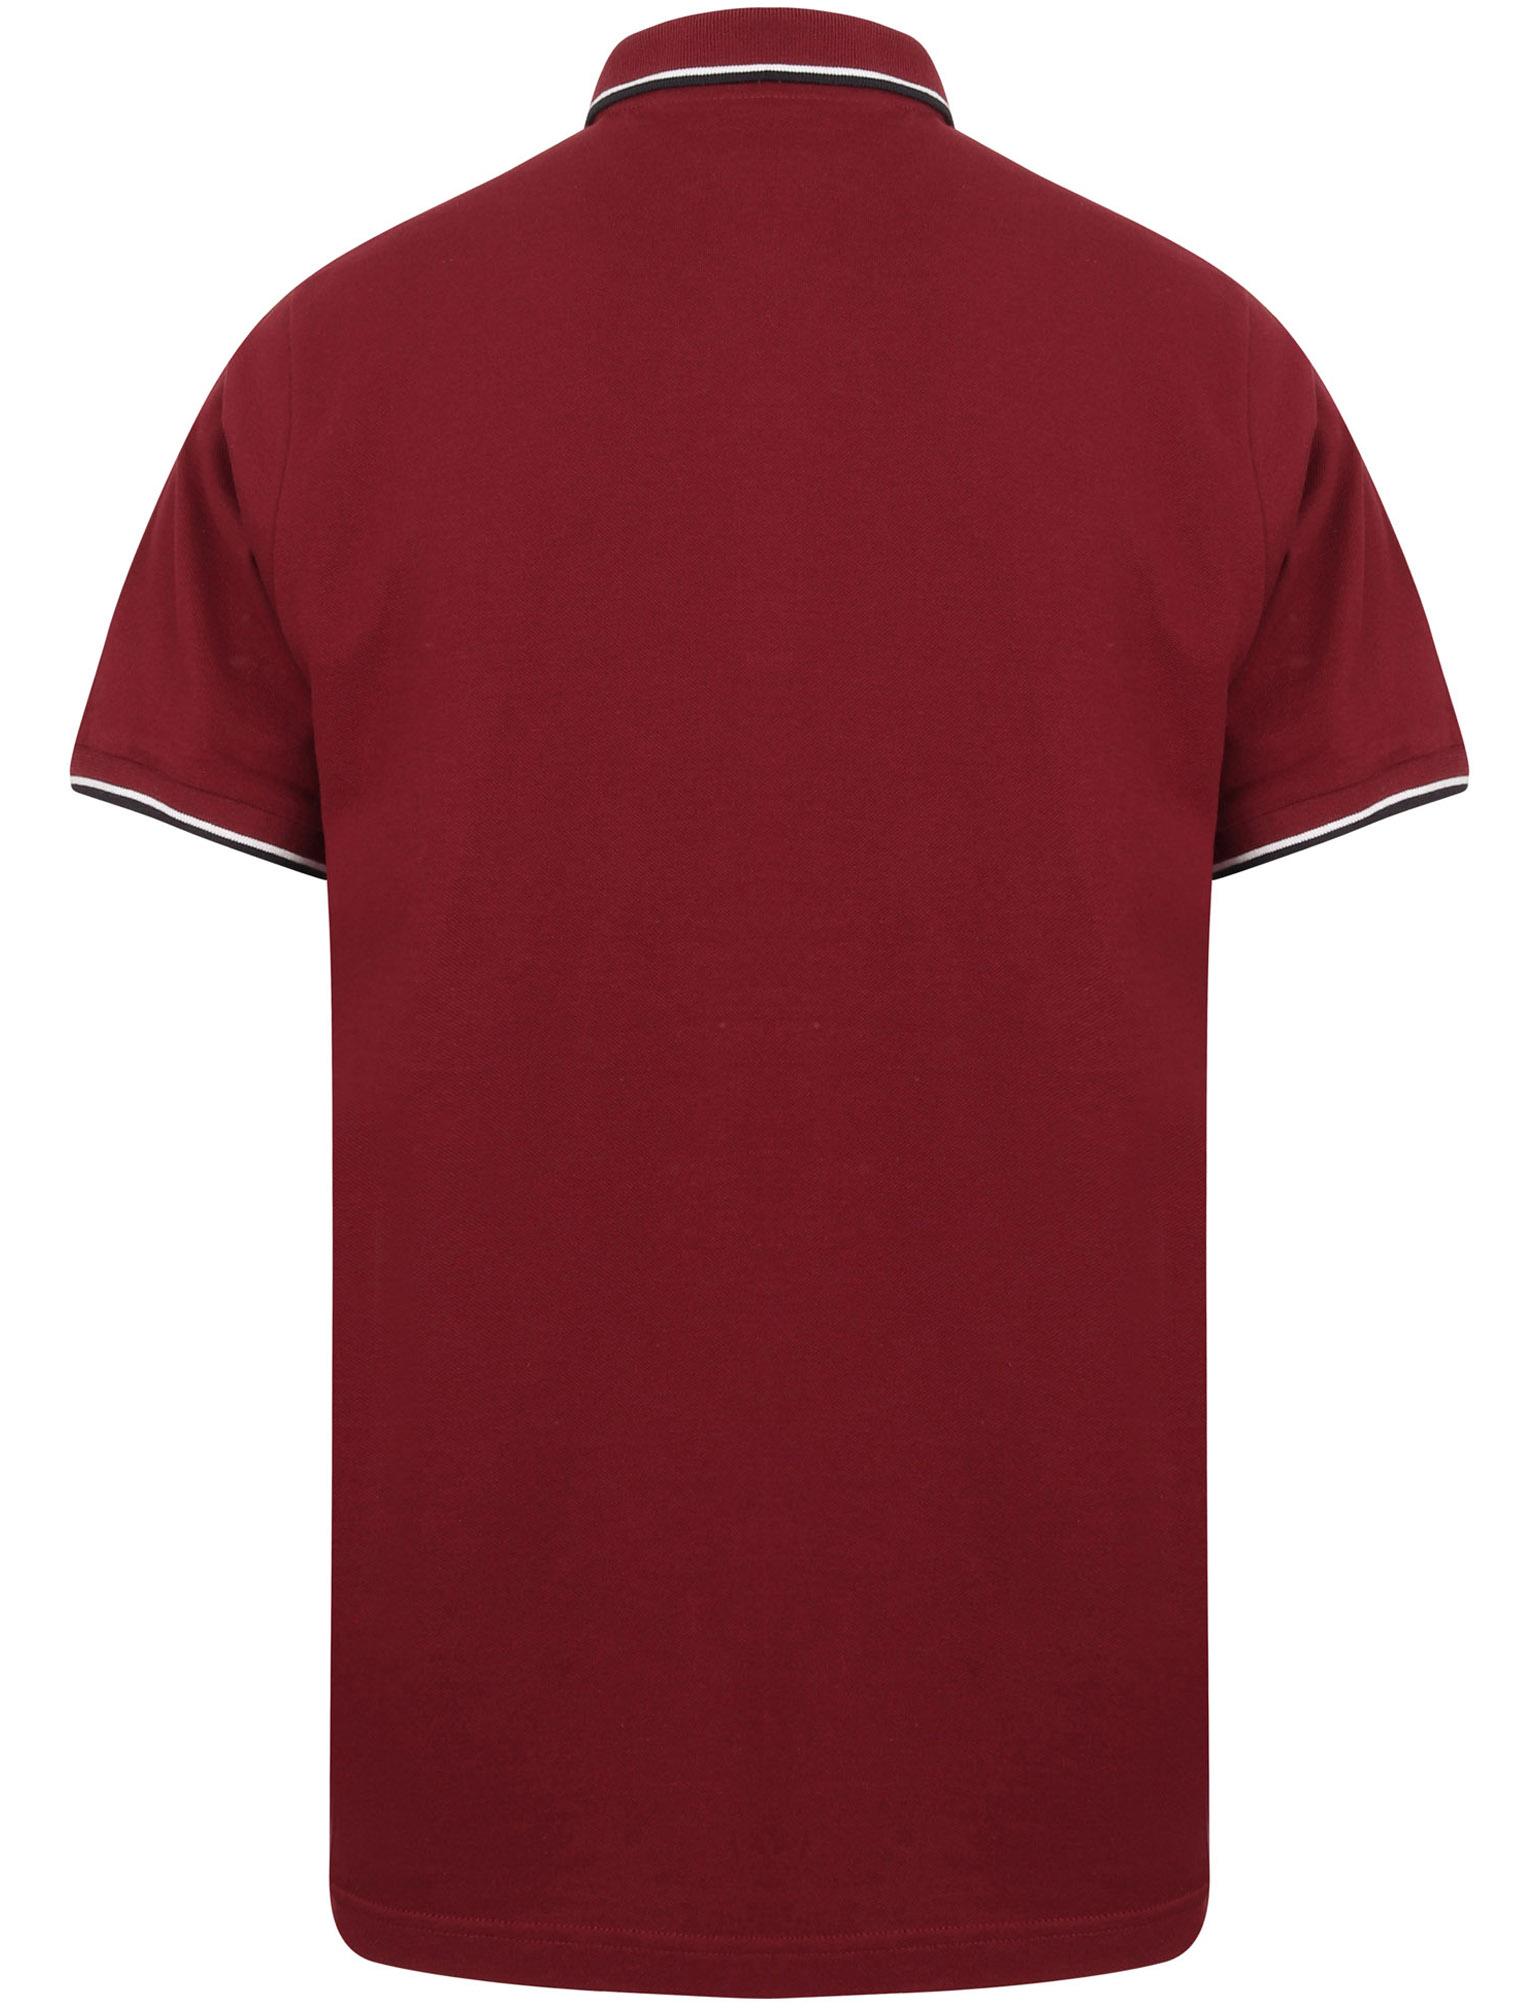 Sth-Shore-Mens-Plain-Polo-Shirt-100-Pique-Cotton-T-Shirt-Top-Collar-Size-M-XXL thumbnail 23